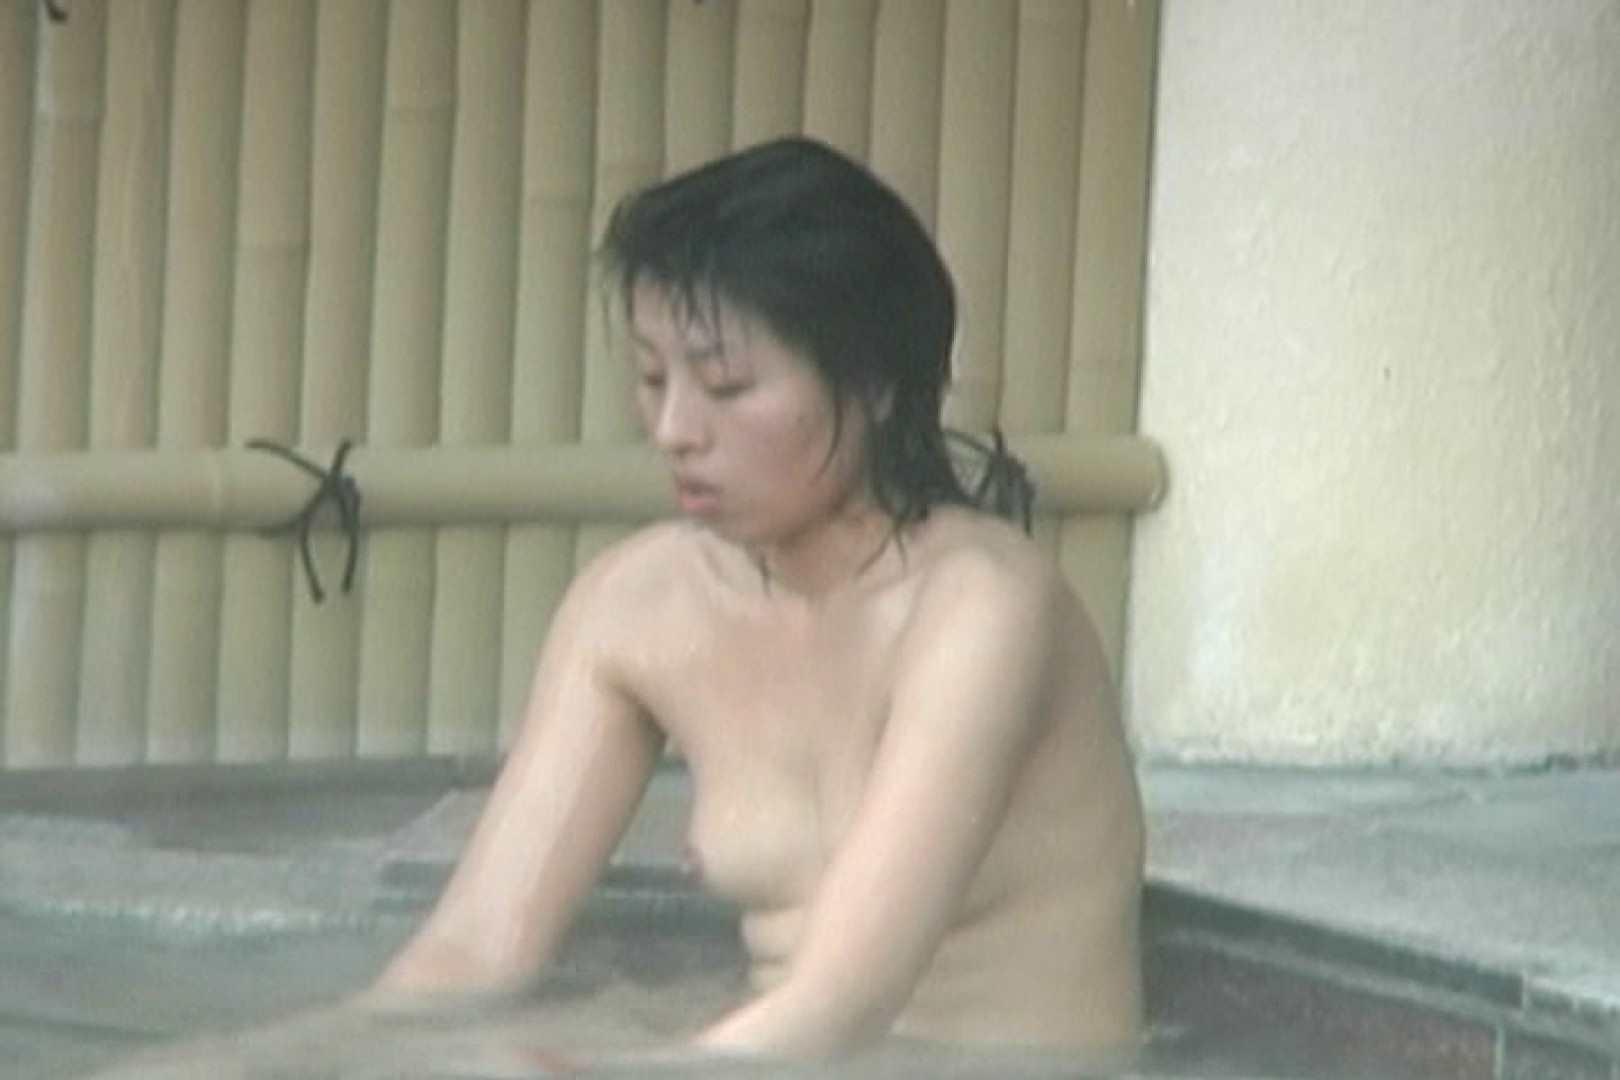 Aquaな露天風呂Vol.589 盗撮シリーズ | 露天風呂編  113PIX 25